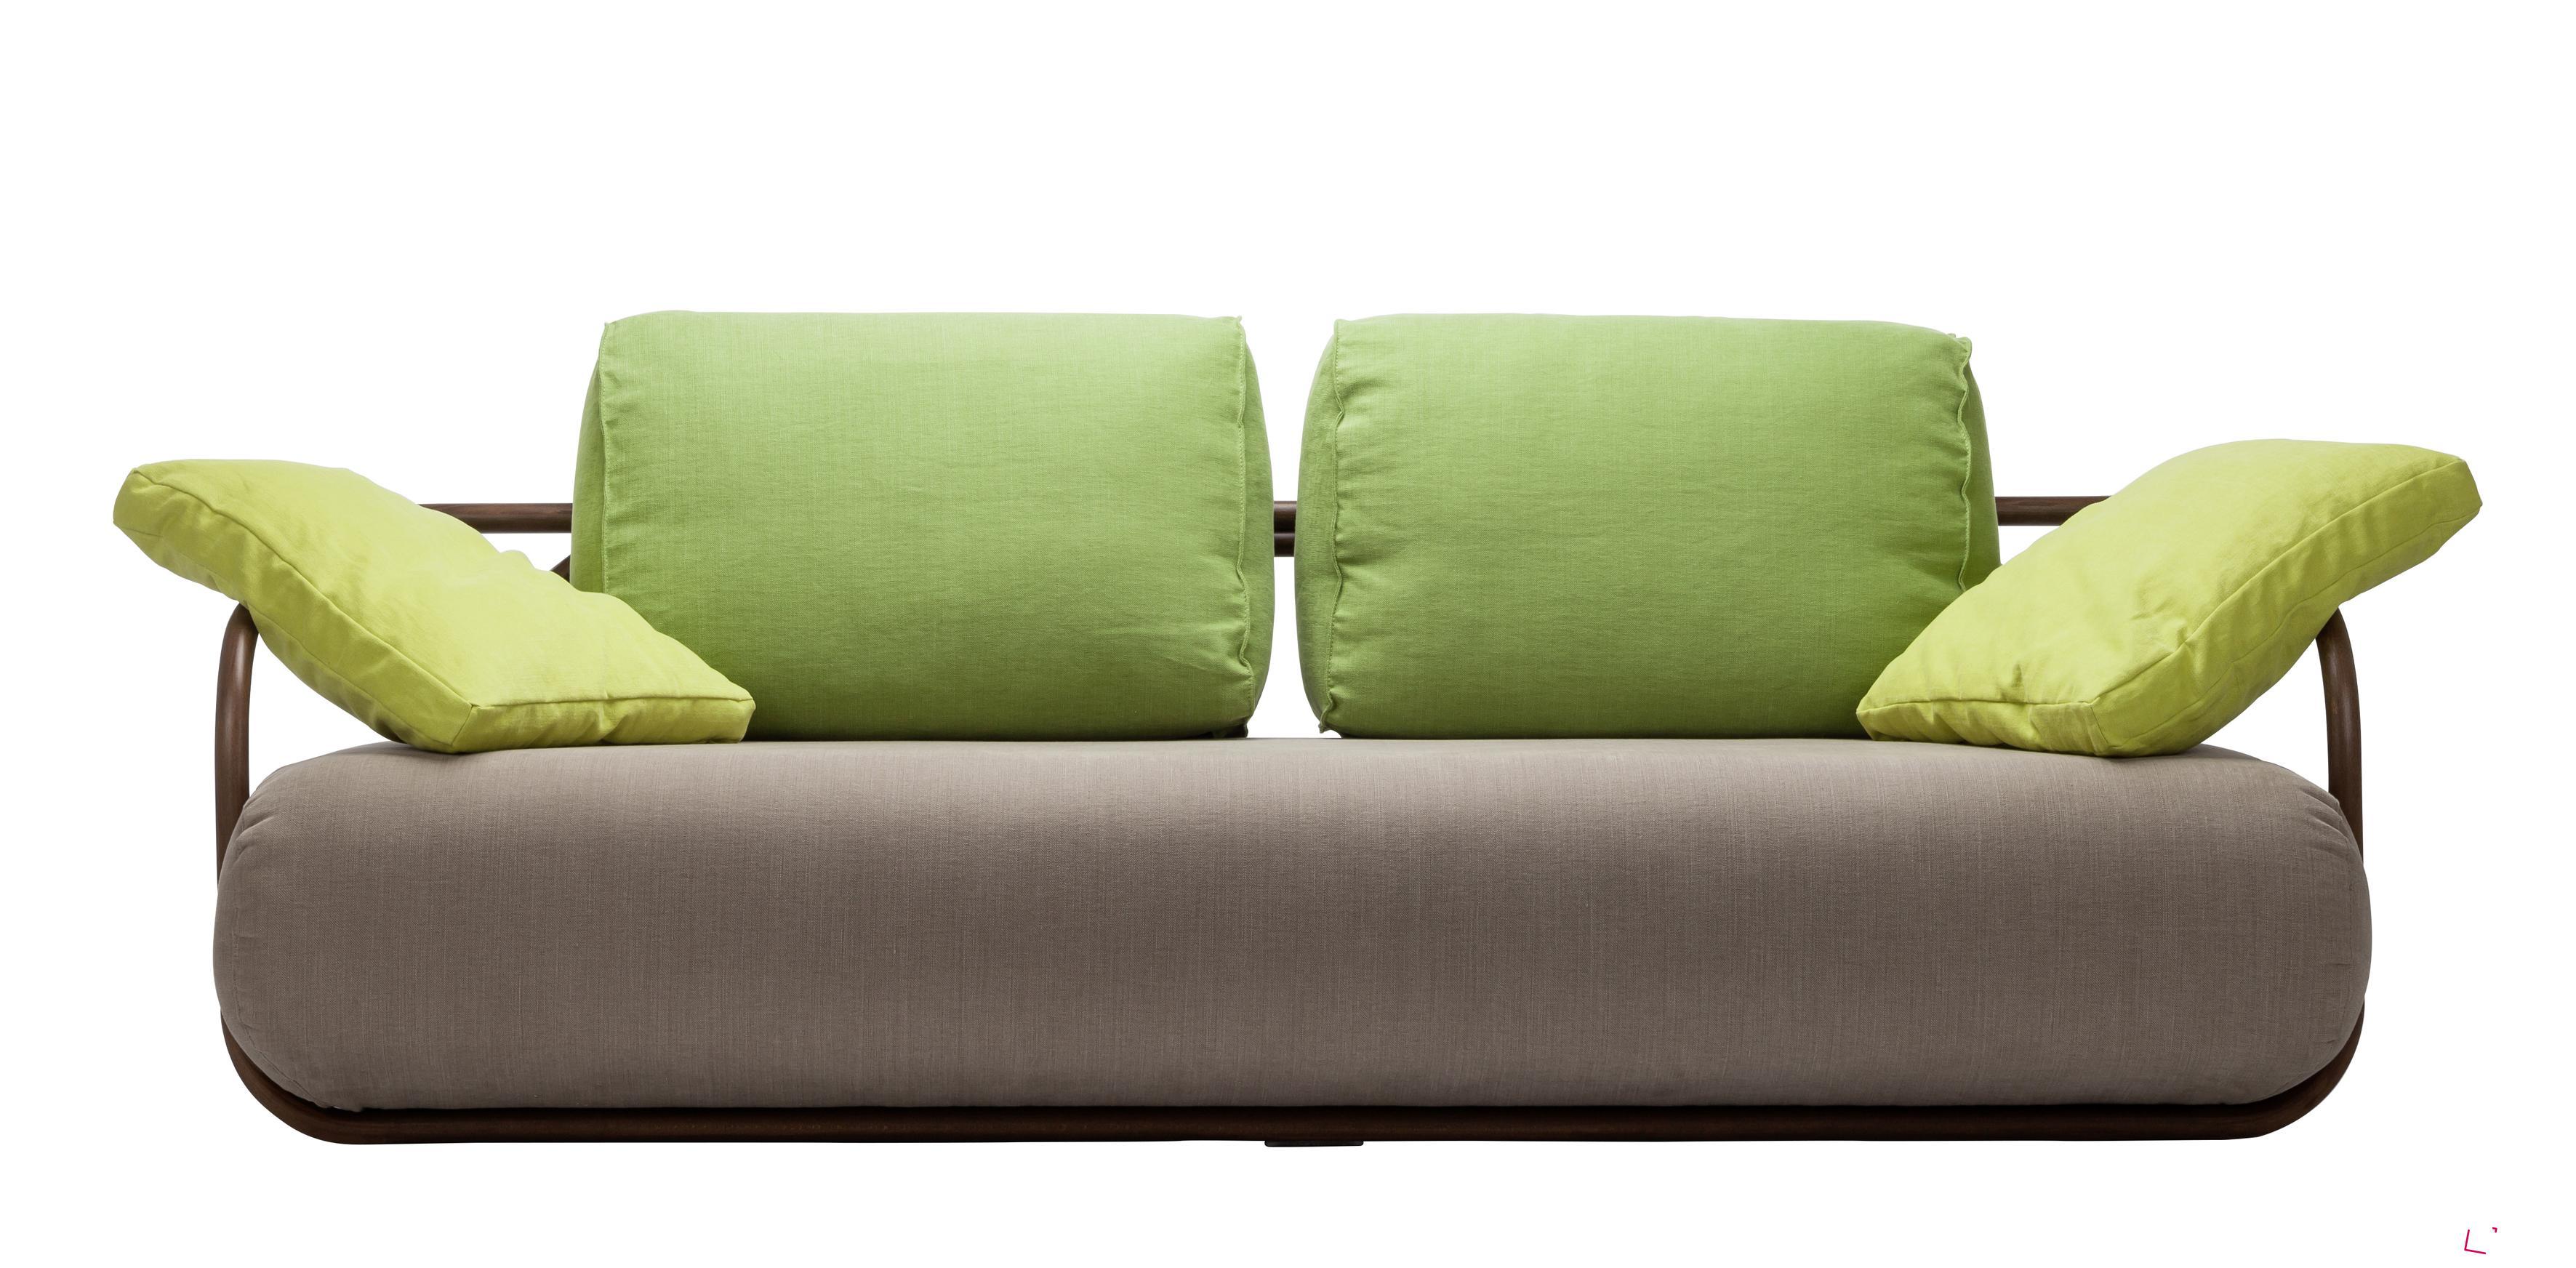 Sofa 2002 (design Christian Werner), Thonet. Sedačka je dílem THONET Studio Frankenberg 02/2015.